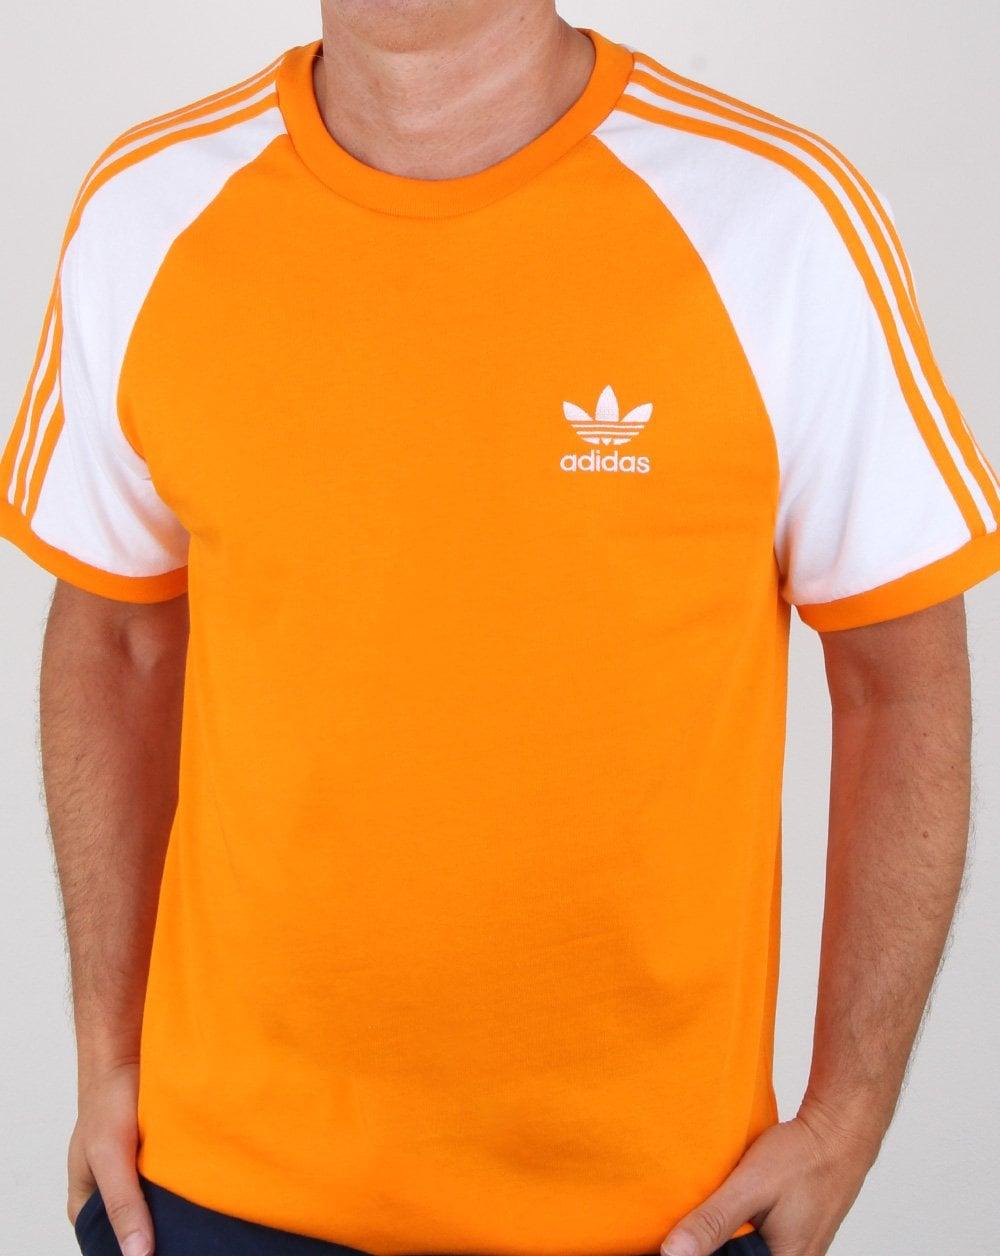 4a670082aa08 Adidas Originals 3 Stripes T Shirt Bright Orange